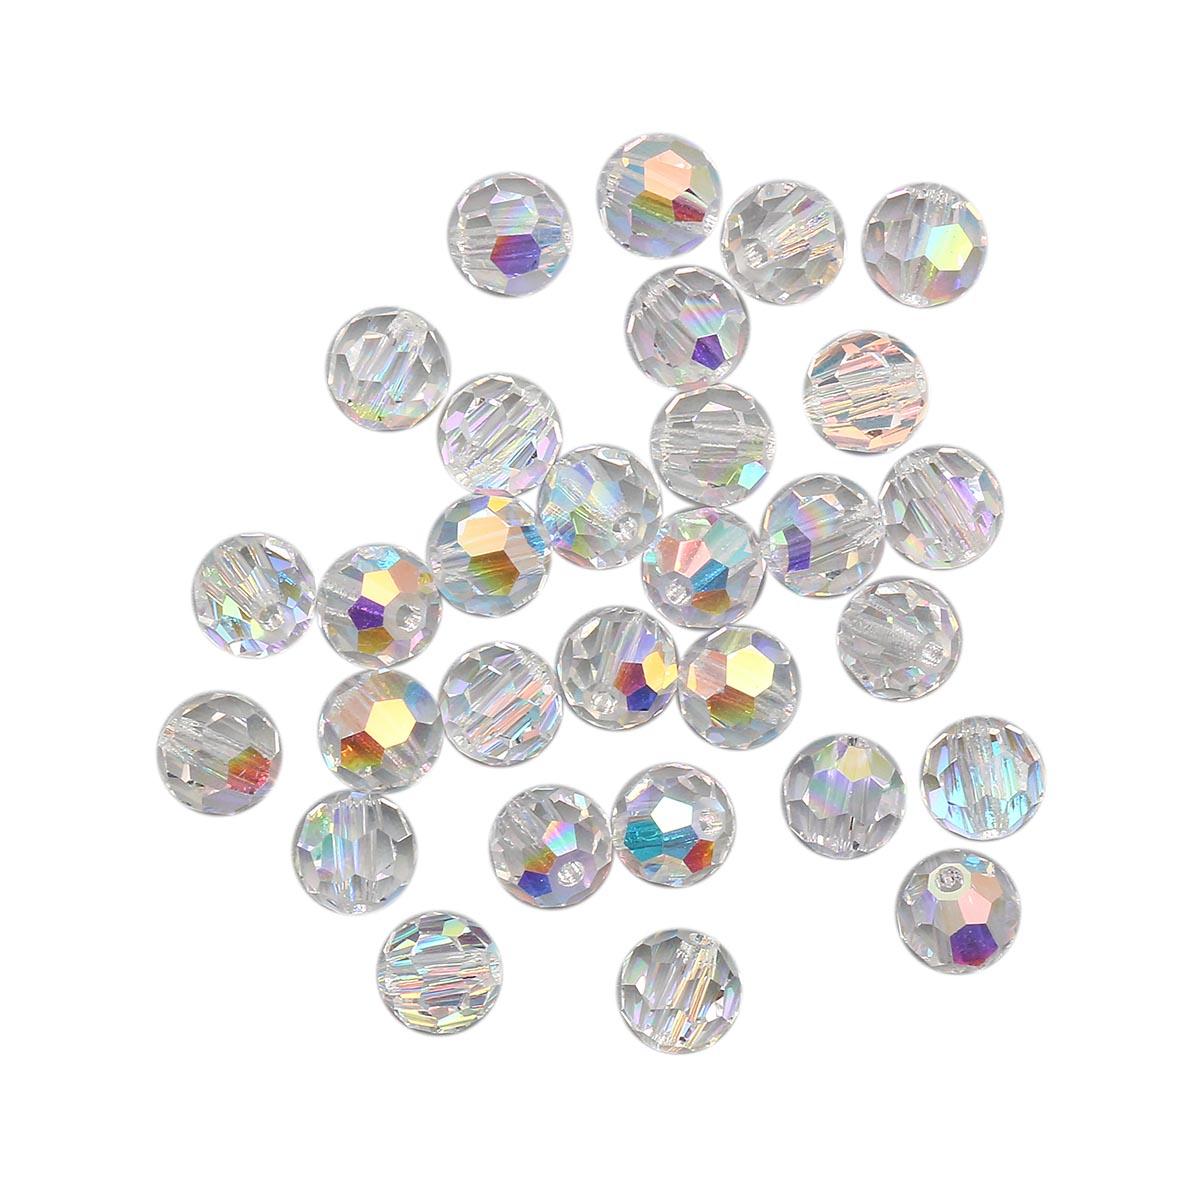 451-19-602 Бусины Круглые Crystal AB 6мм. 30 шт. Preciosa